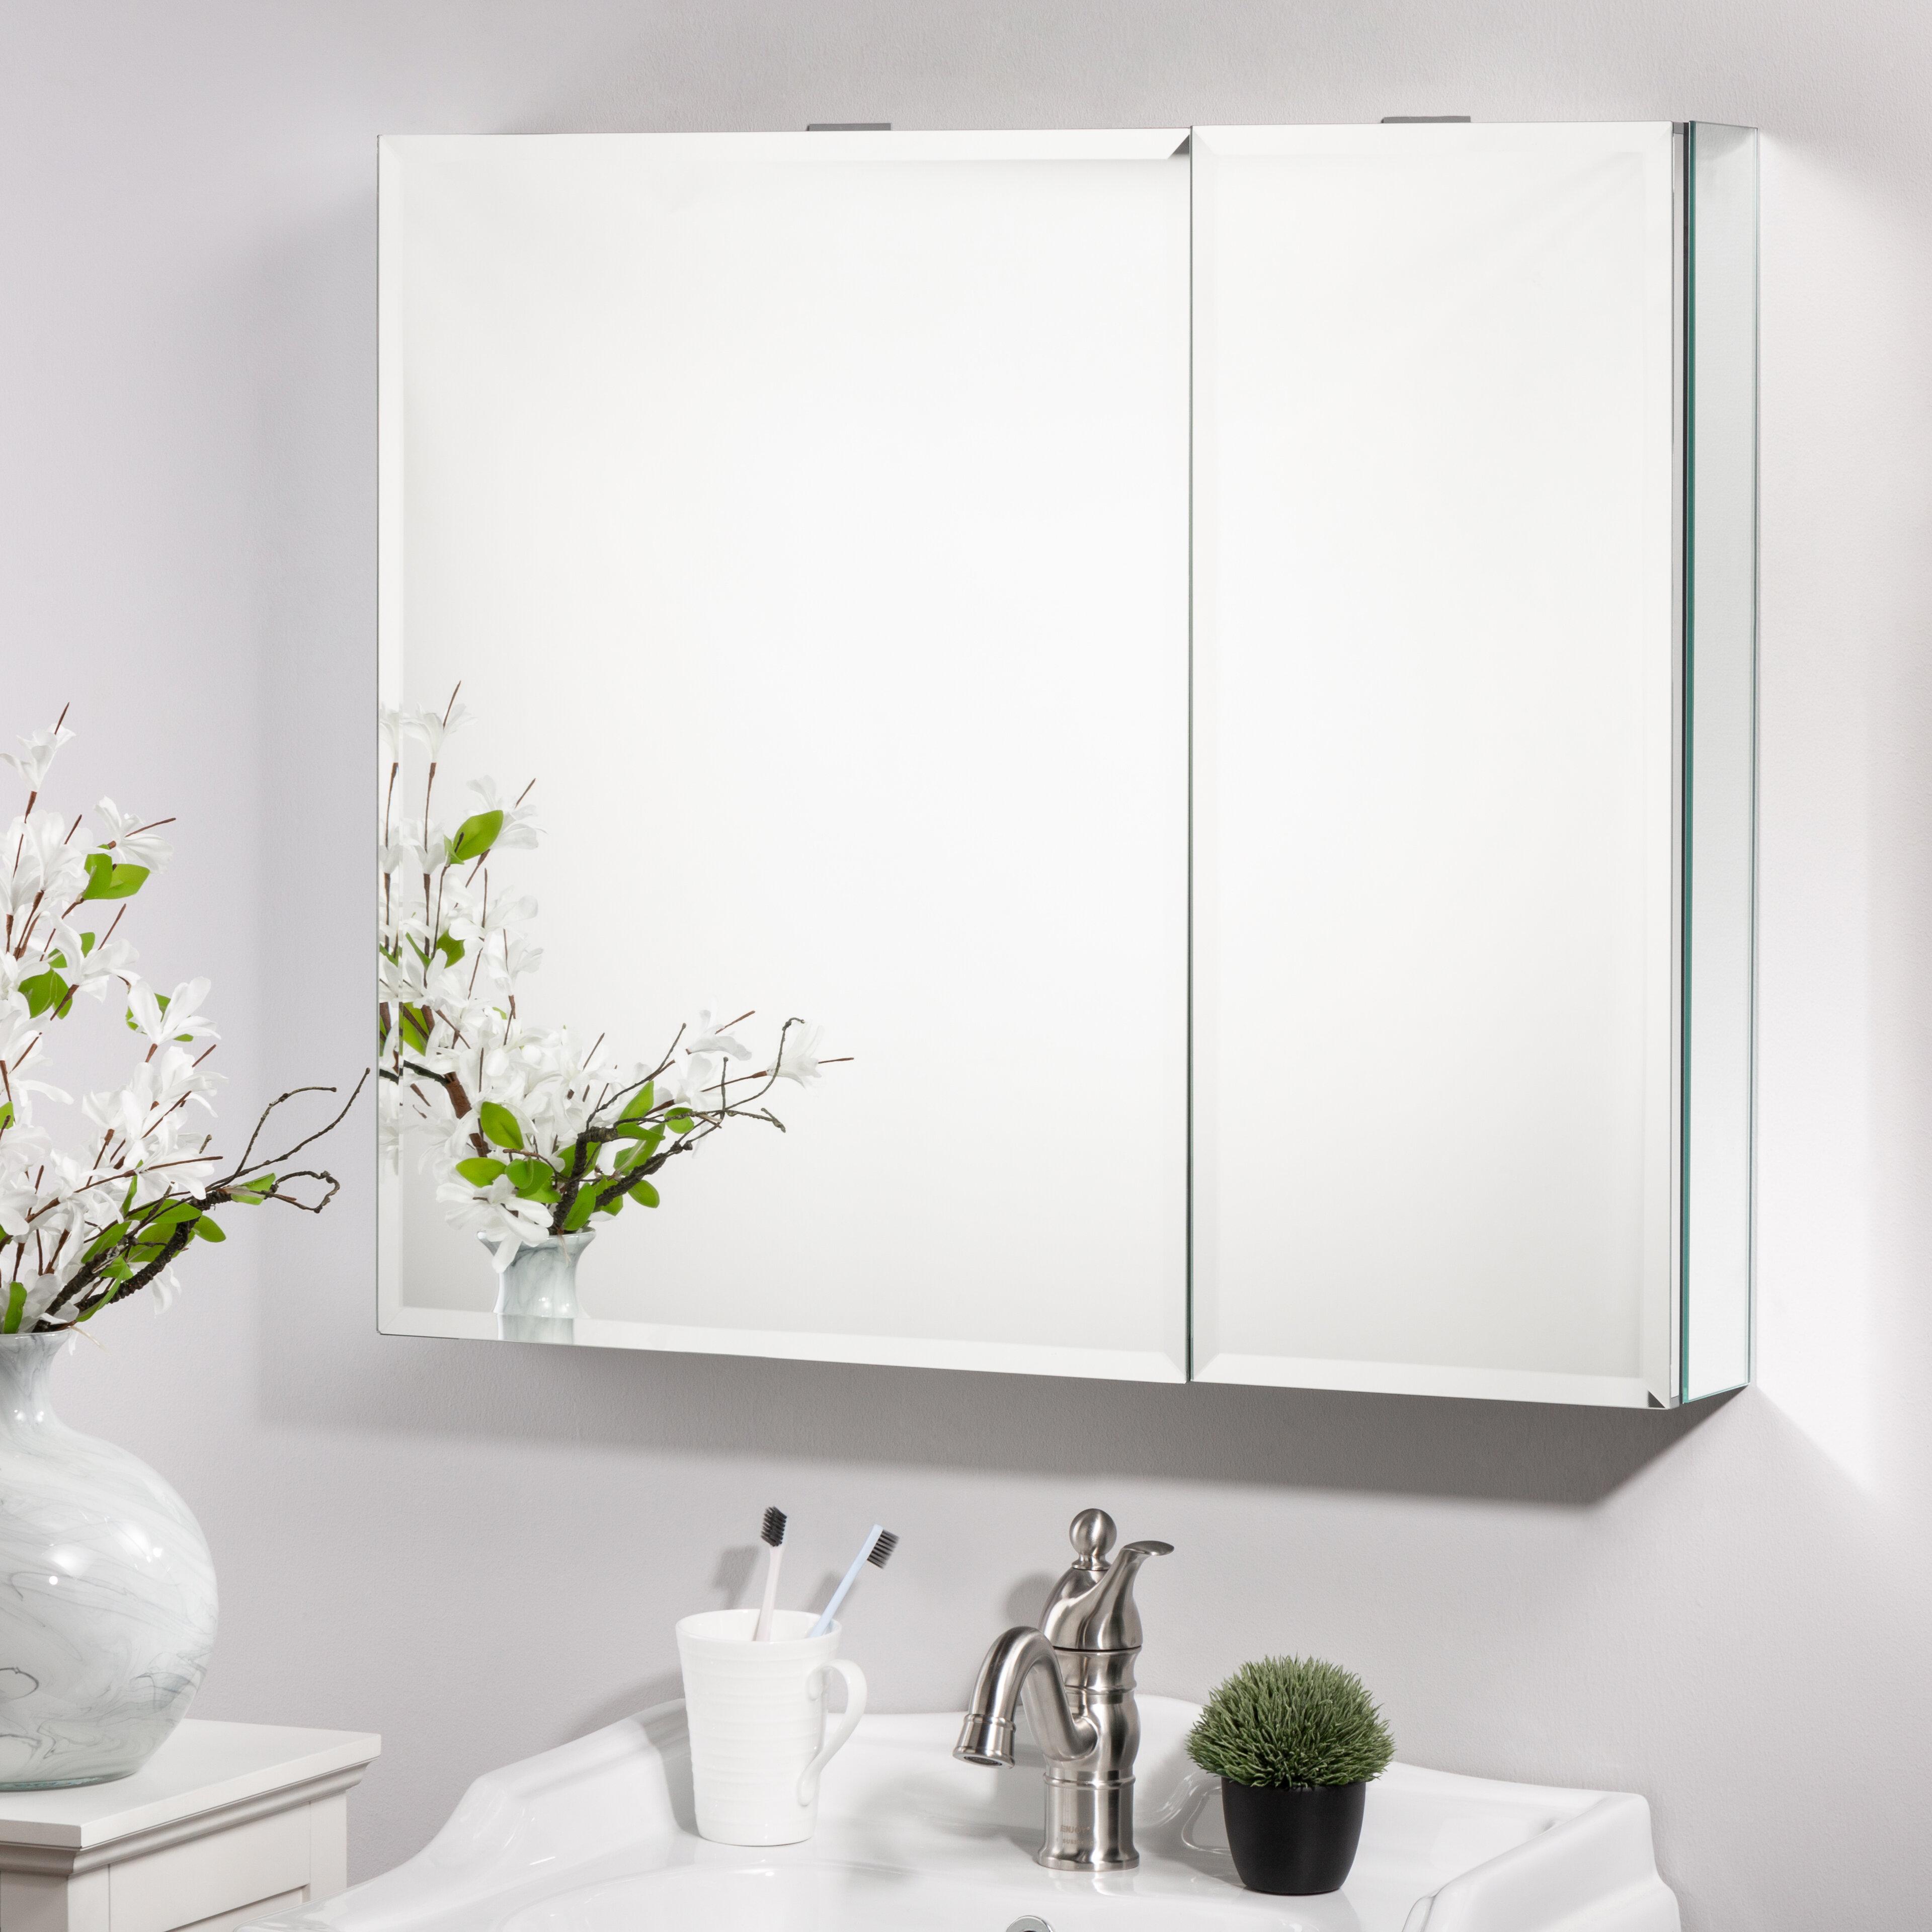 Ebern Designs Alfredina Recessed Or Surface Mount Frameless 2 Door Medicine Cabinet With 6 Shelves Wayfair